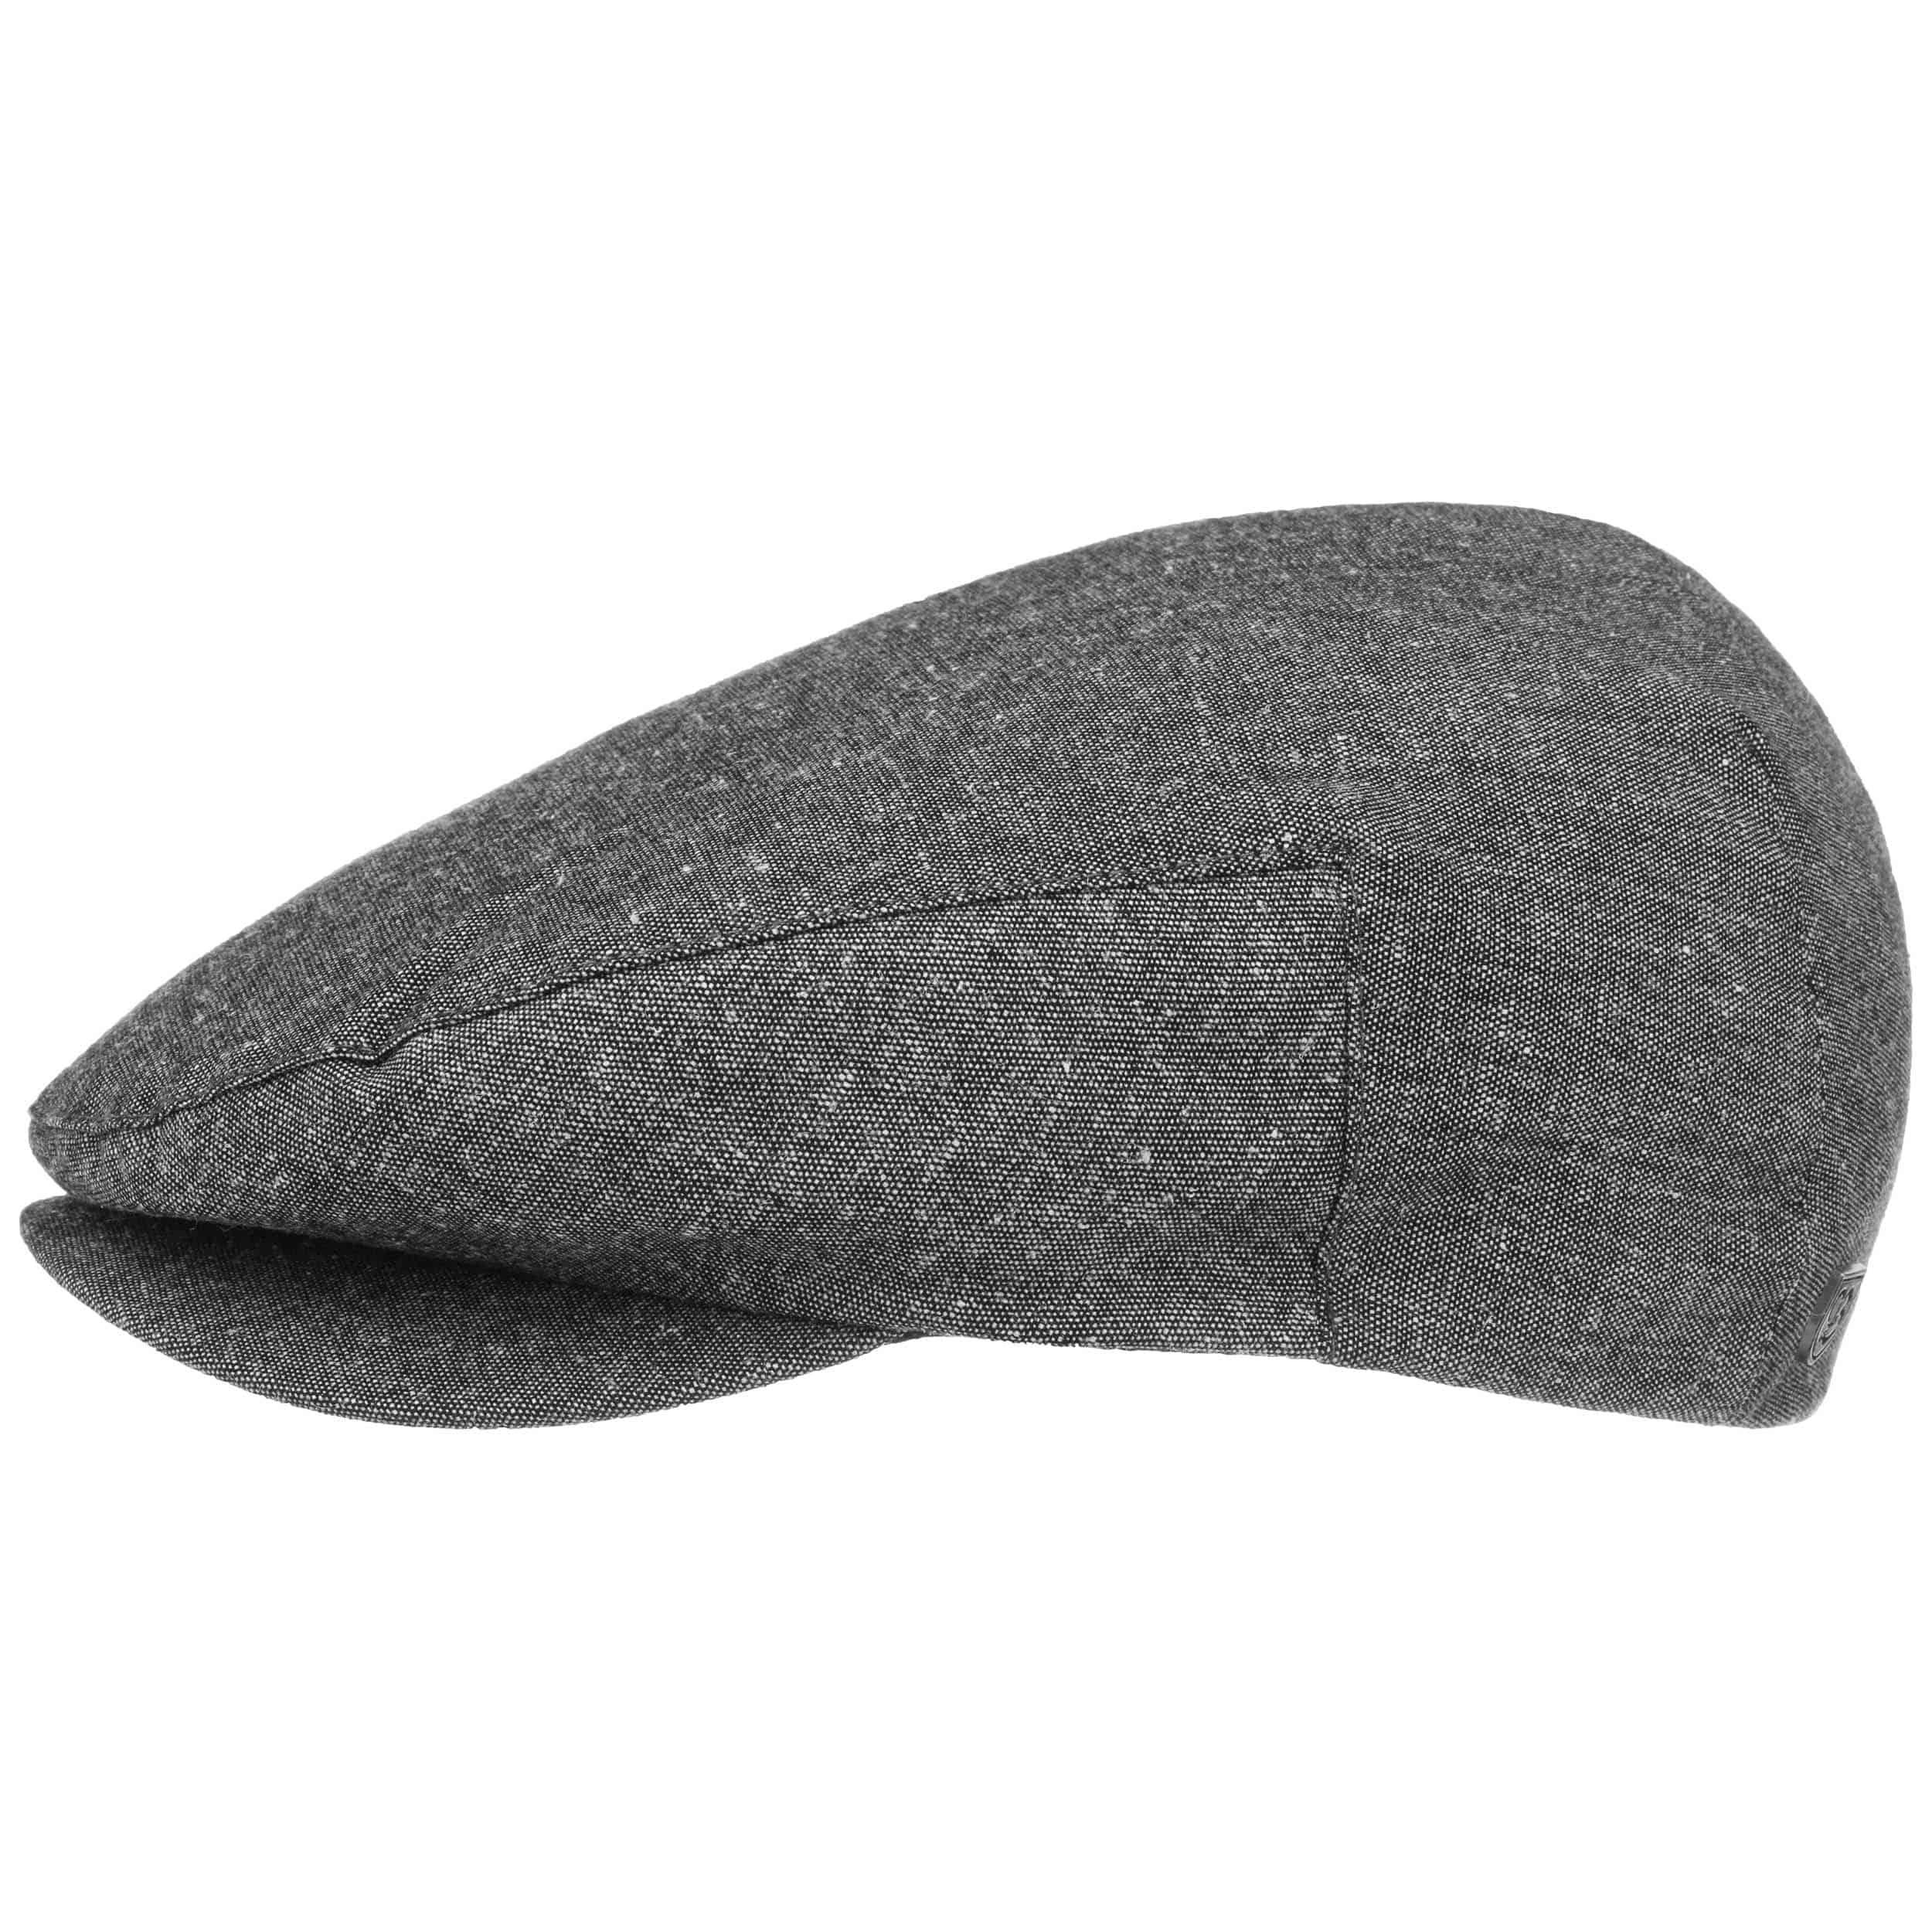 b78254fe5158 ... brown 1 · Hooligan Linen Flat Cap by Brixton - black 5